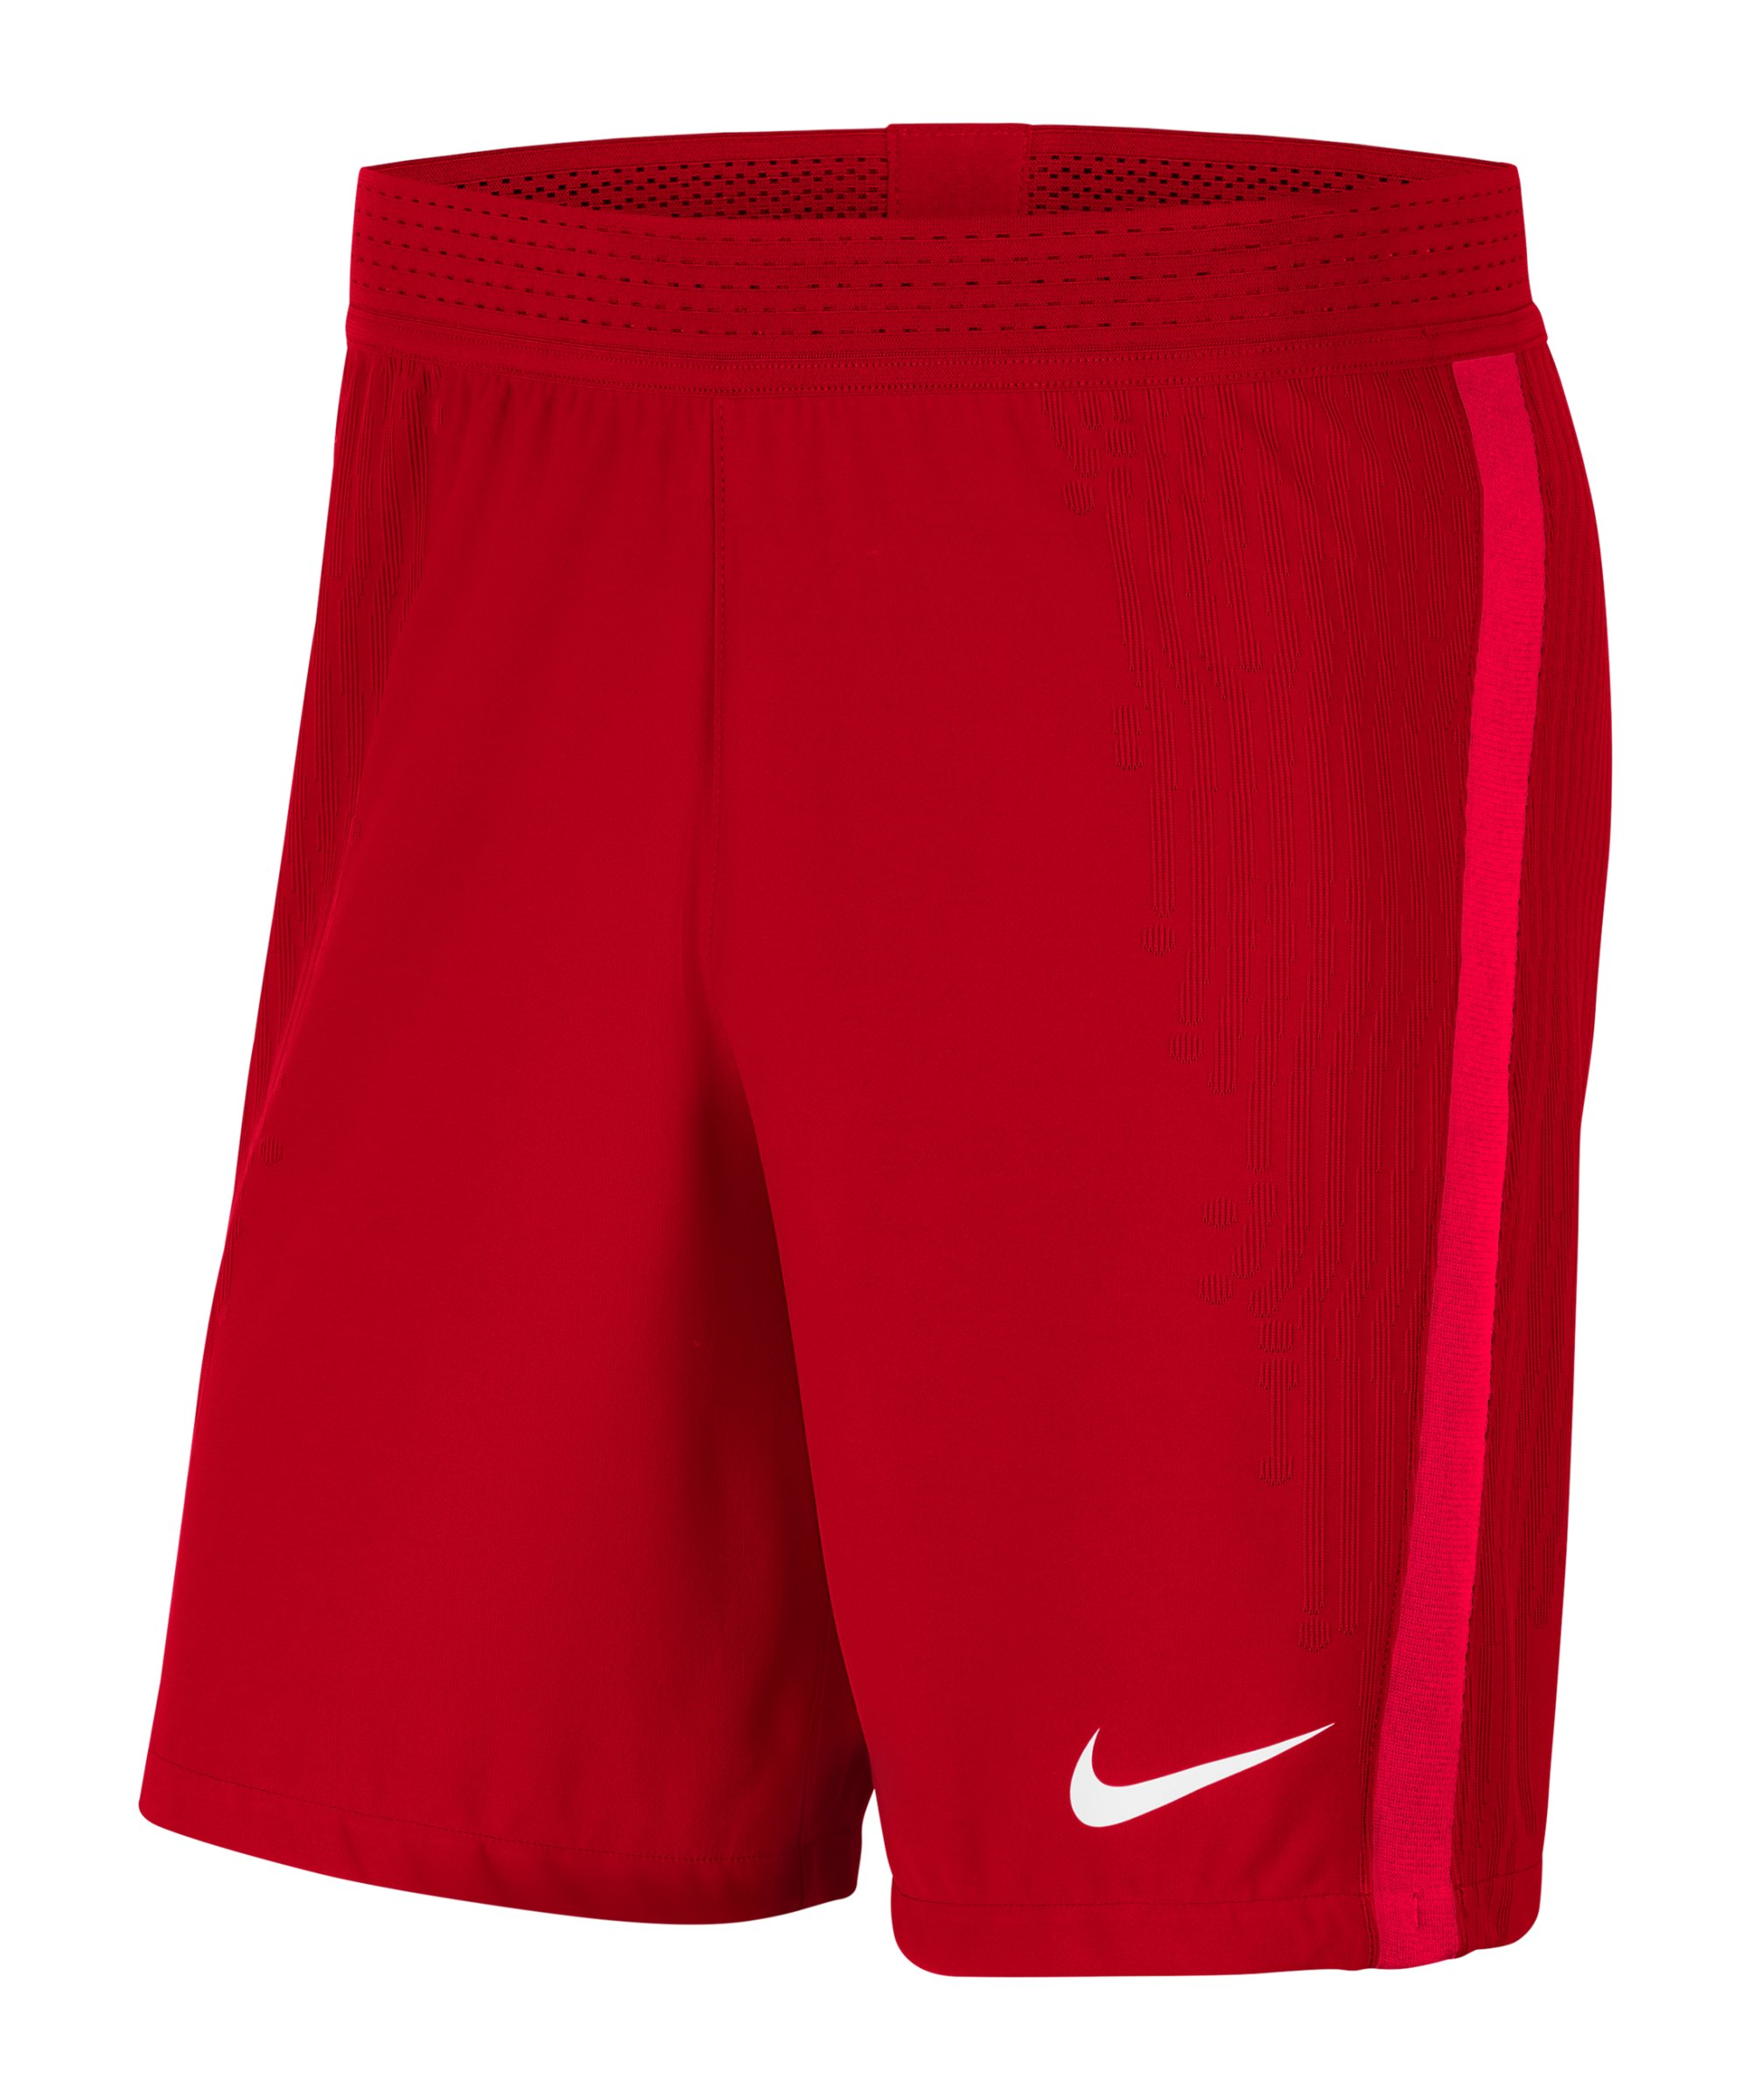 Nike Vapor Knit III Short Rot Weiss F657 - rot